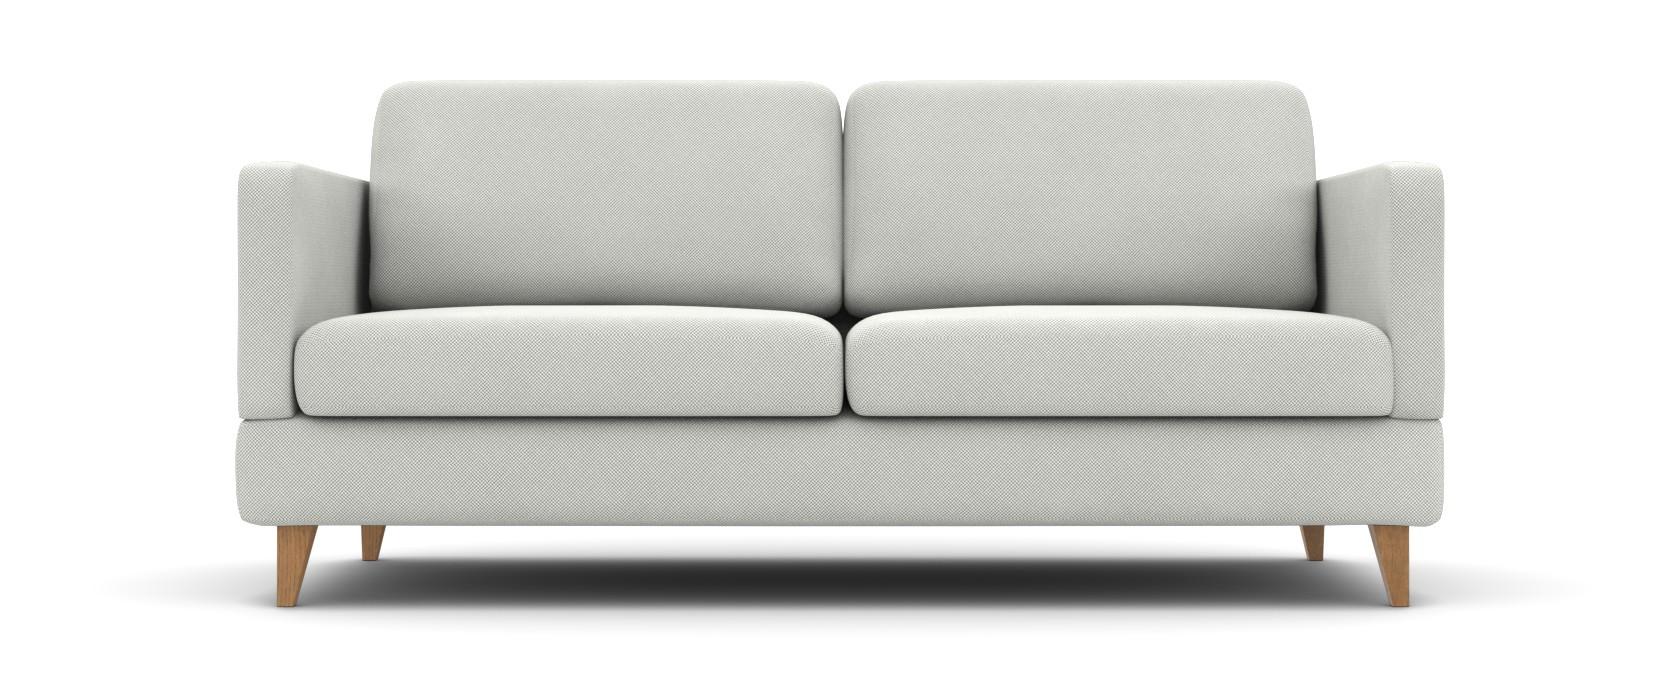 Трехместный диван Bruno Club - Фото 1 - Pufetto